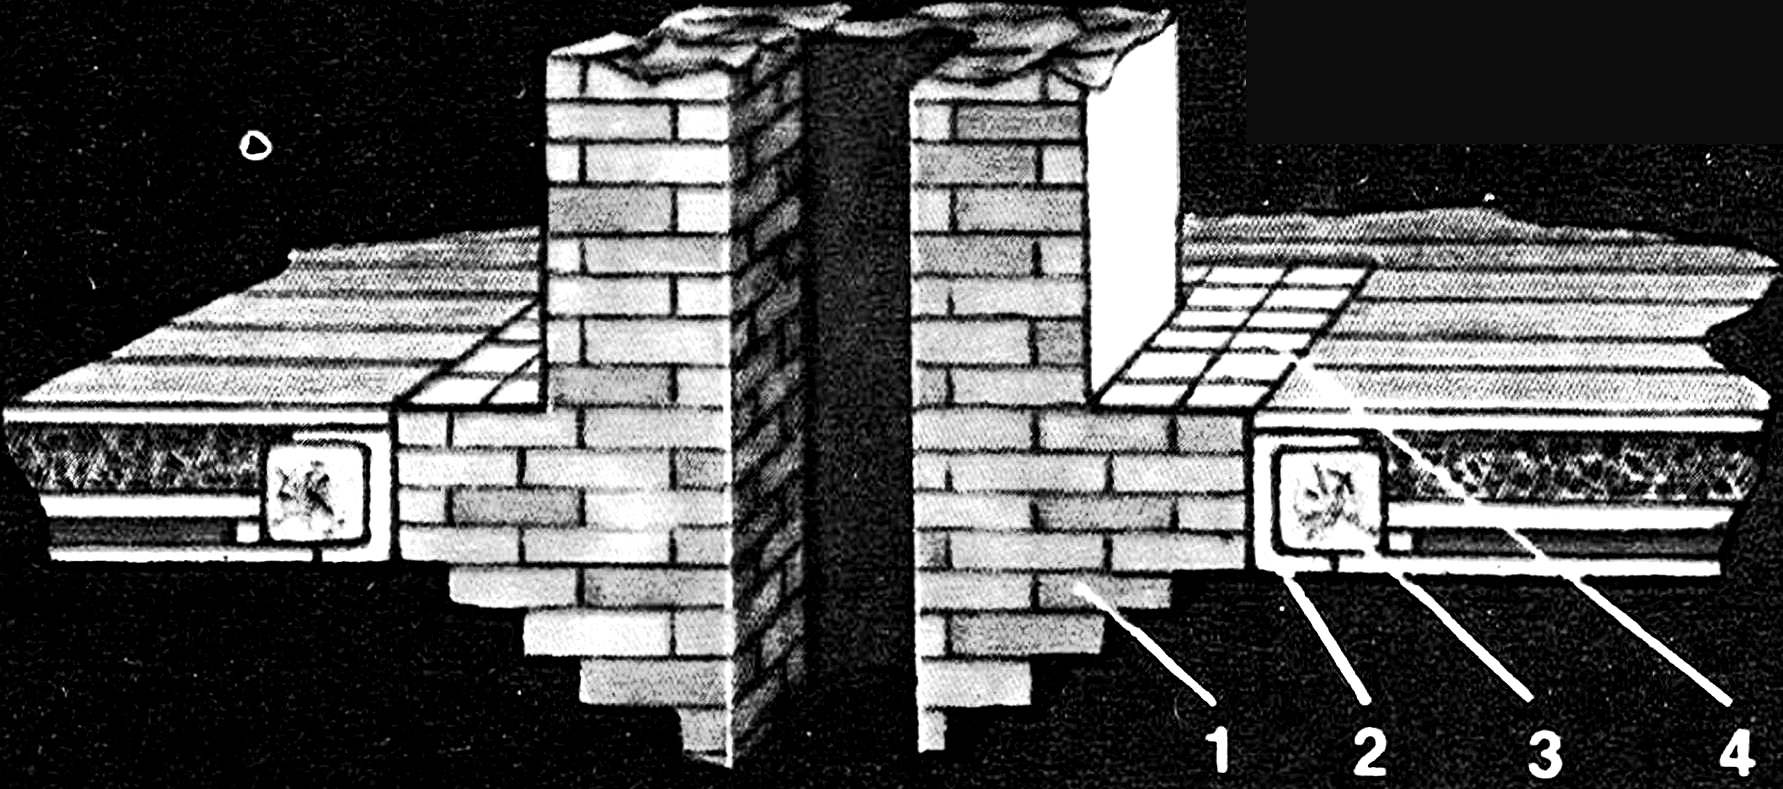 Pass the chimney through interfloor overlap.